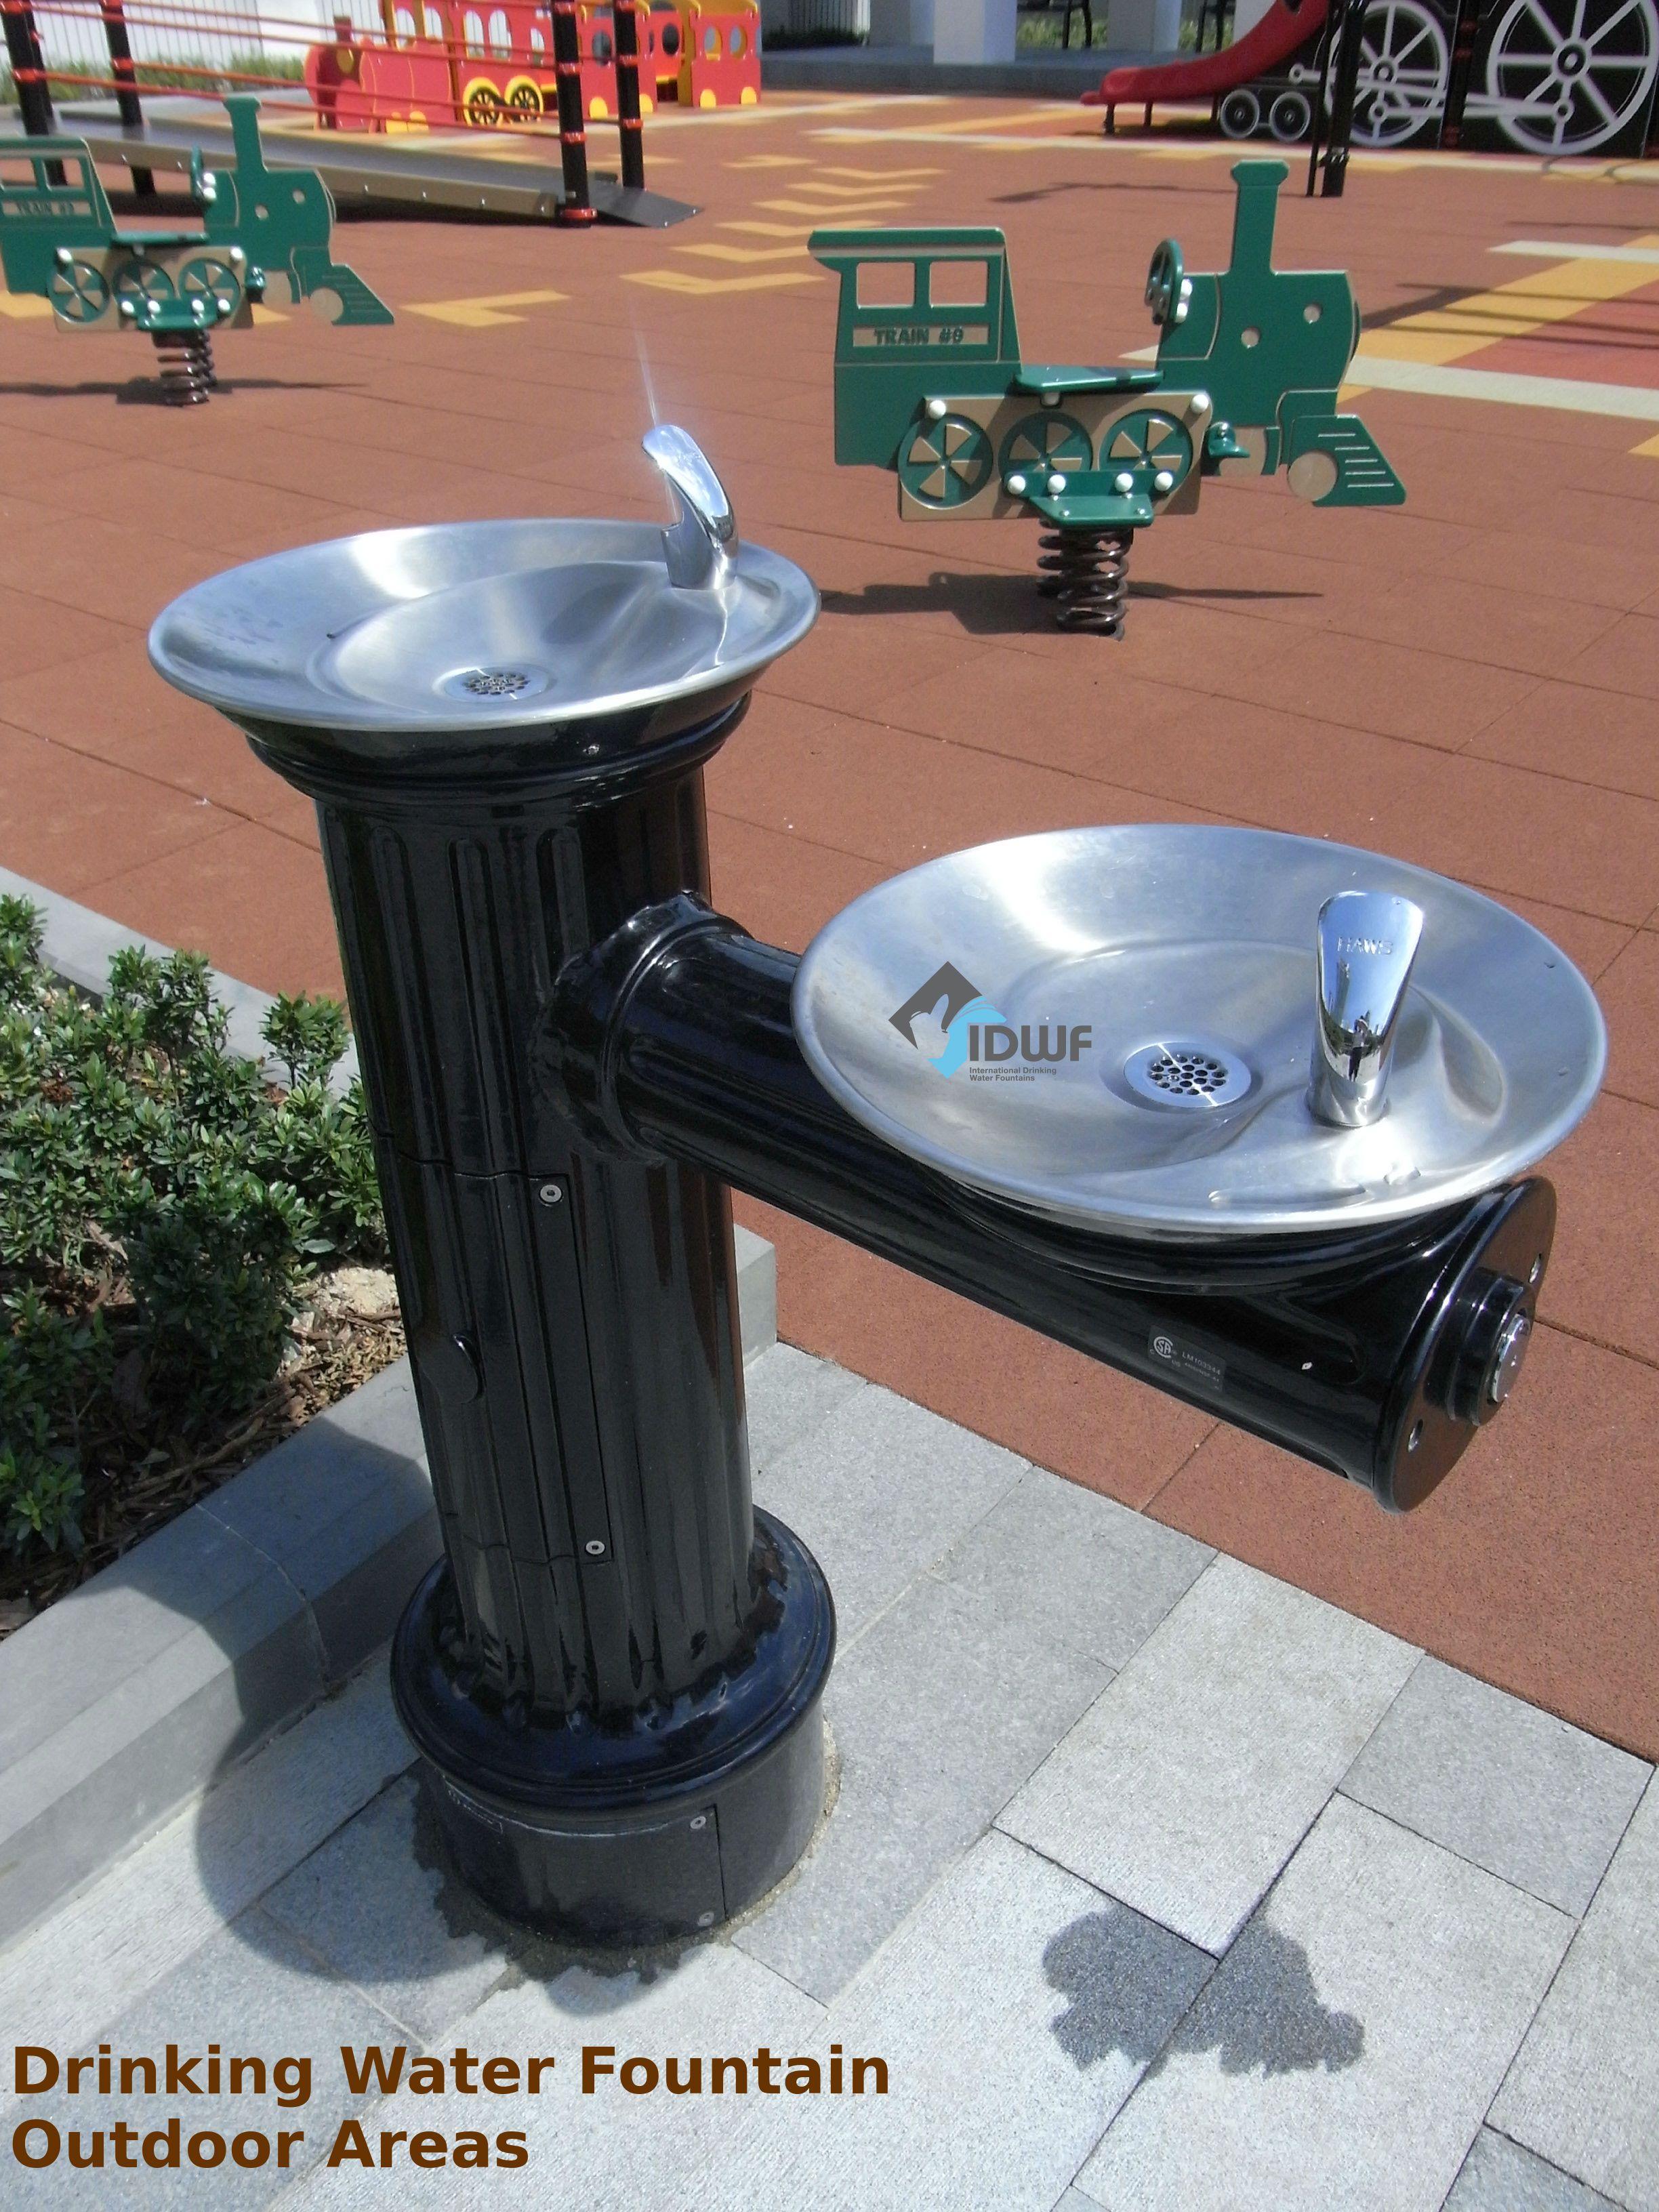 Outdoor Drinking Fountains International Drinking Water Fountains Drinking Water Fountain Outdoor Drinking Fountain Water Fountain